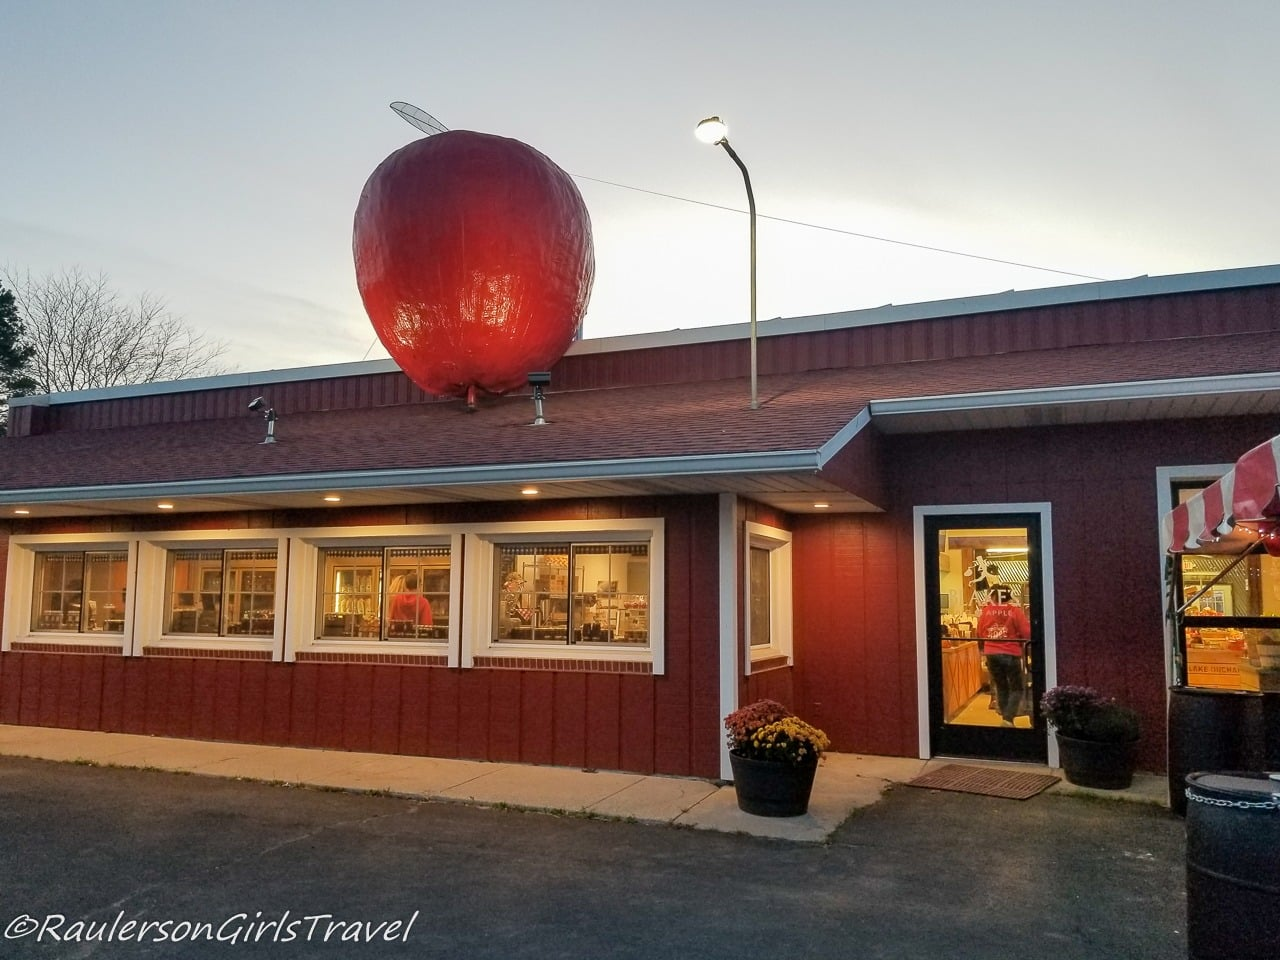 Blake's Big Apple Cider Mill - Michigan Cider Mills